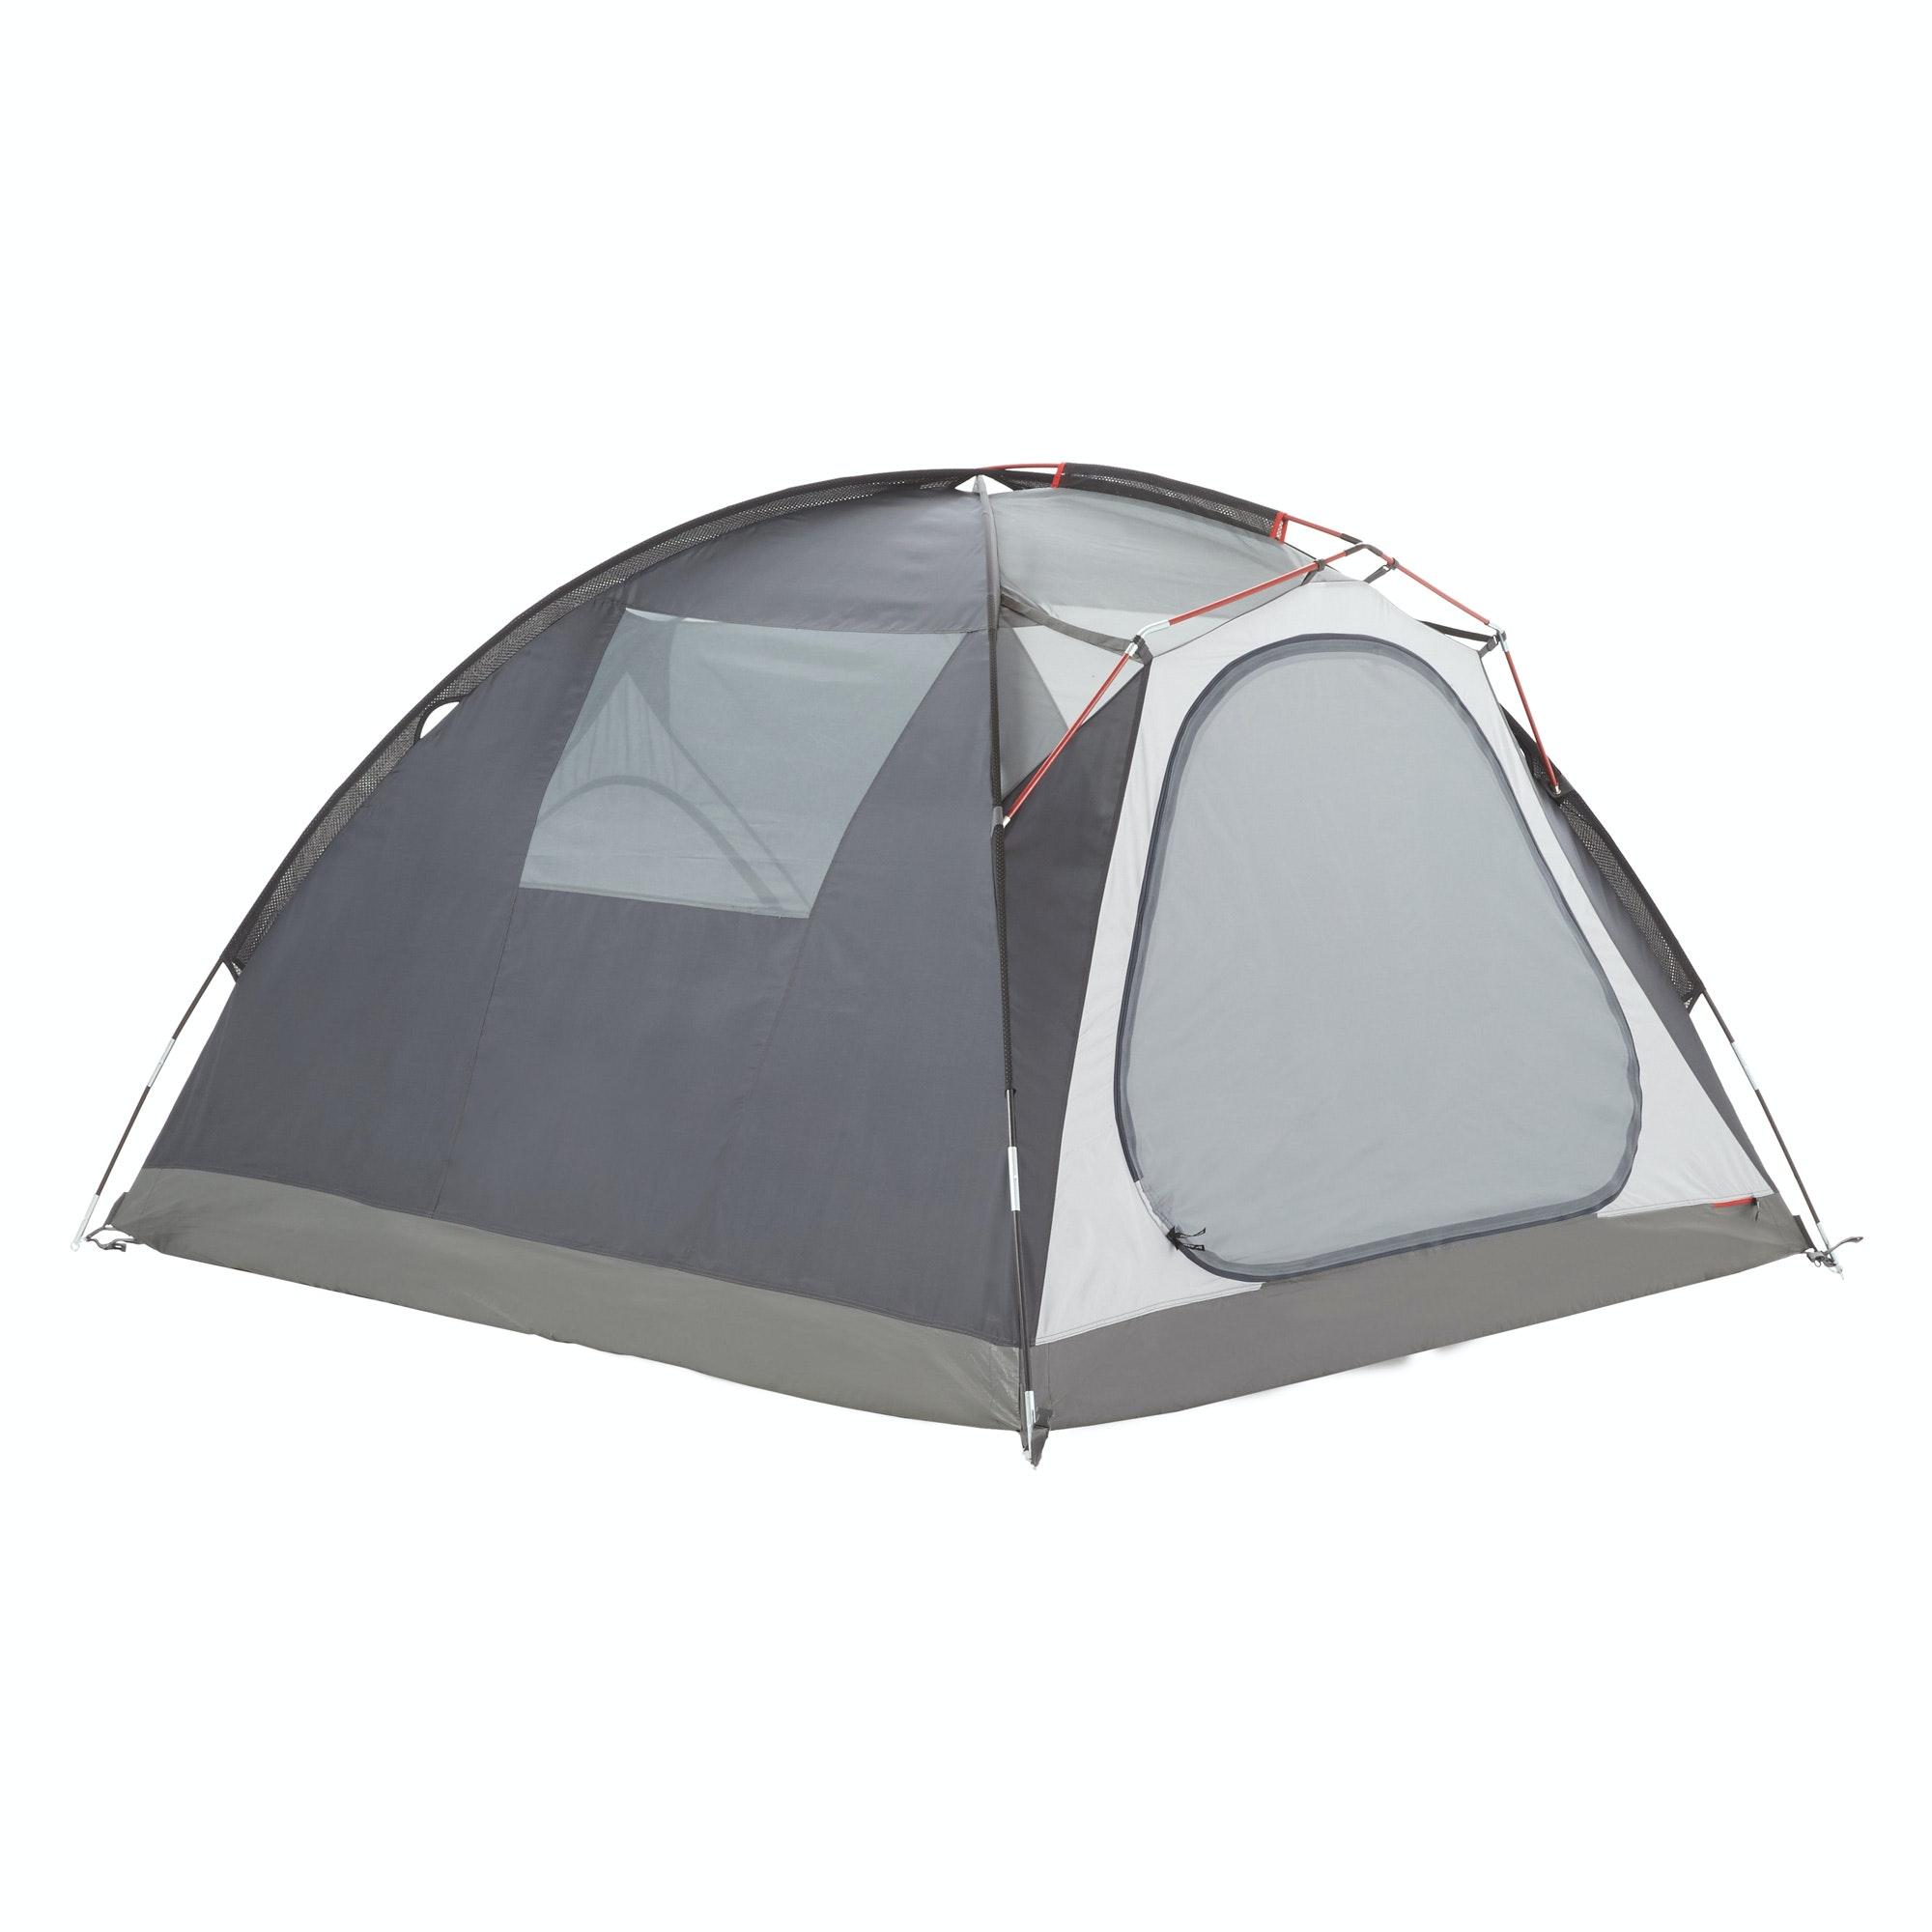 Khyam Igloo 3 Man Tent Quick Erect Pop Up Popup Motorcycle Cing  sc 1 st  Best Tent 2018 & 3 Man Tent Sale - Best Tent 2018